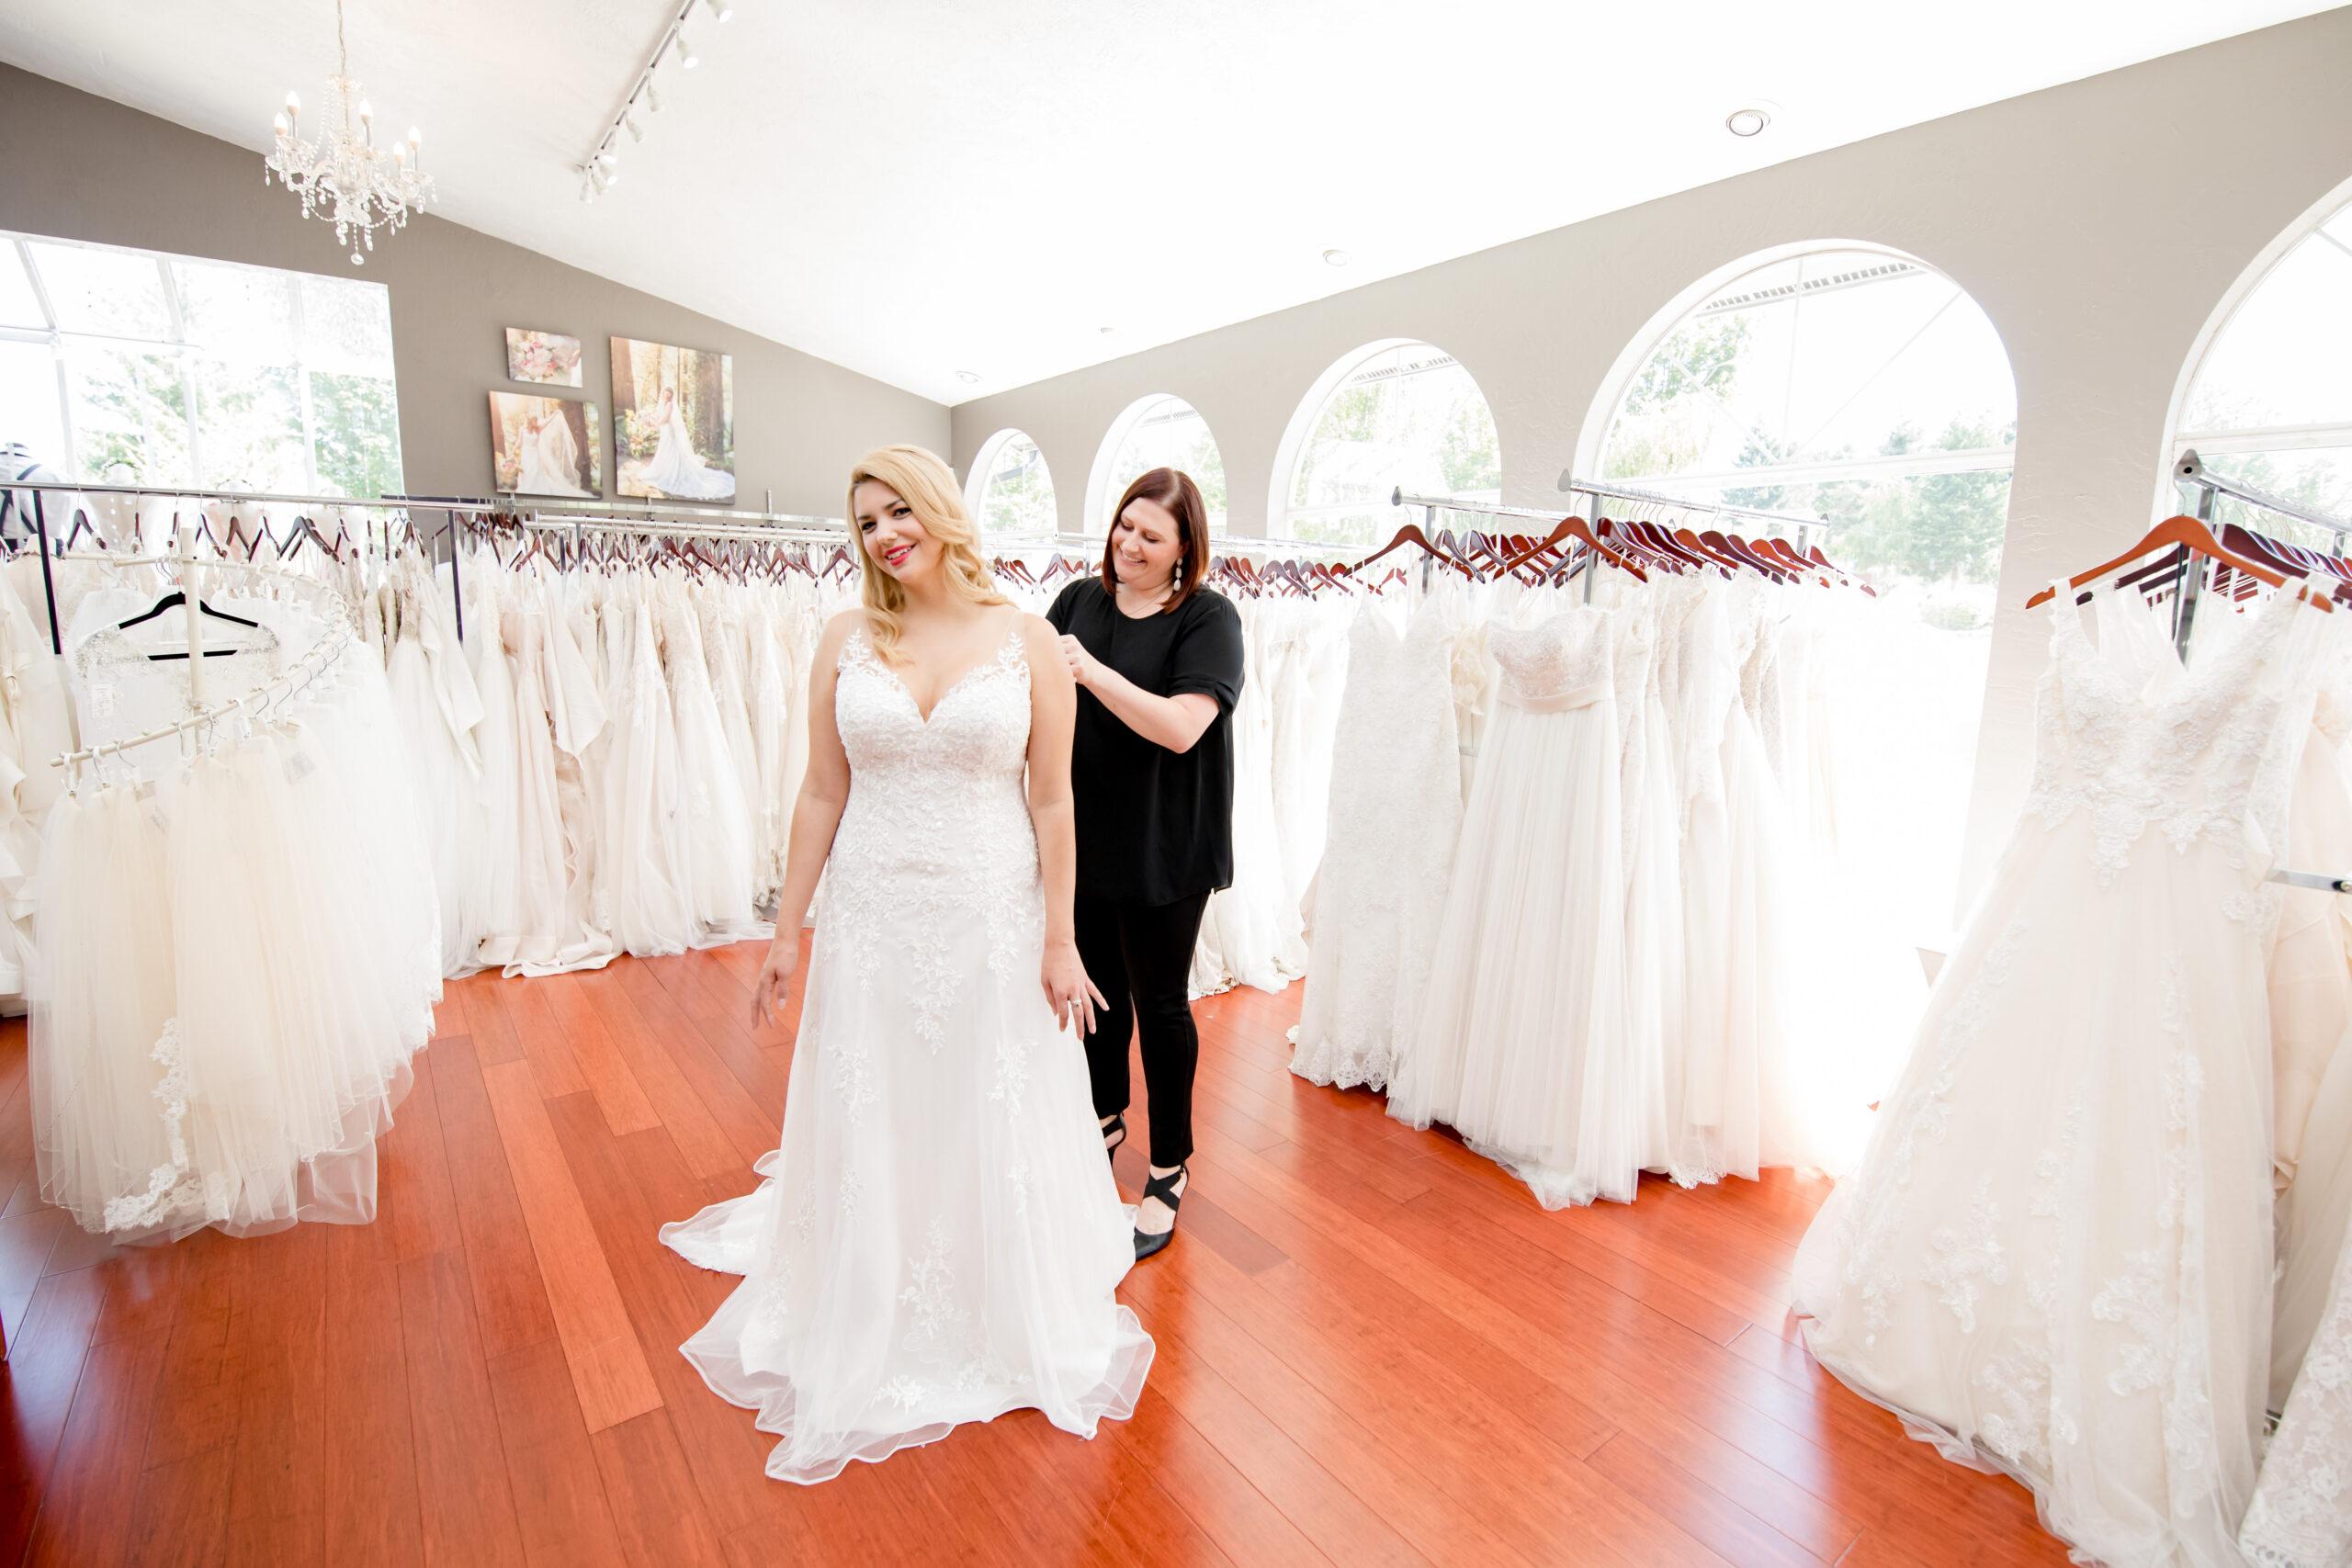 Bridal shop in west bend Wisconsin